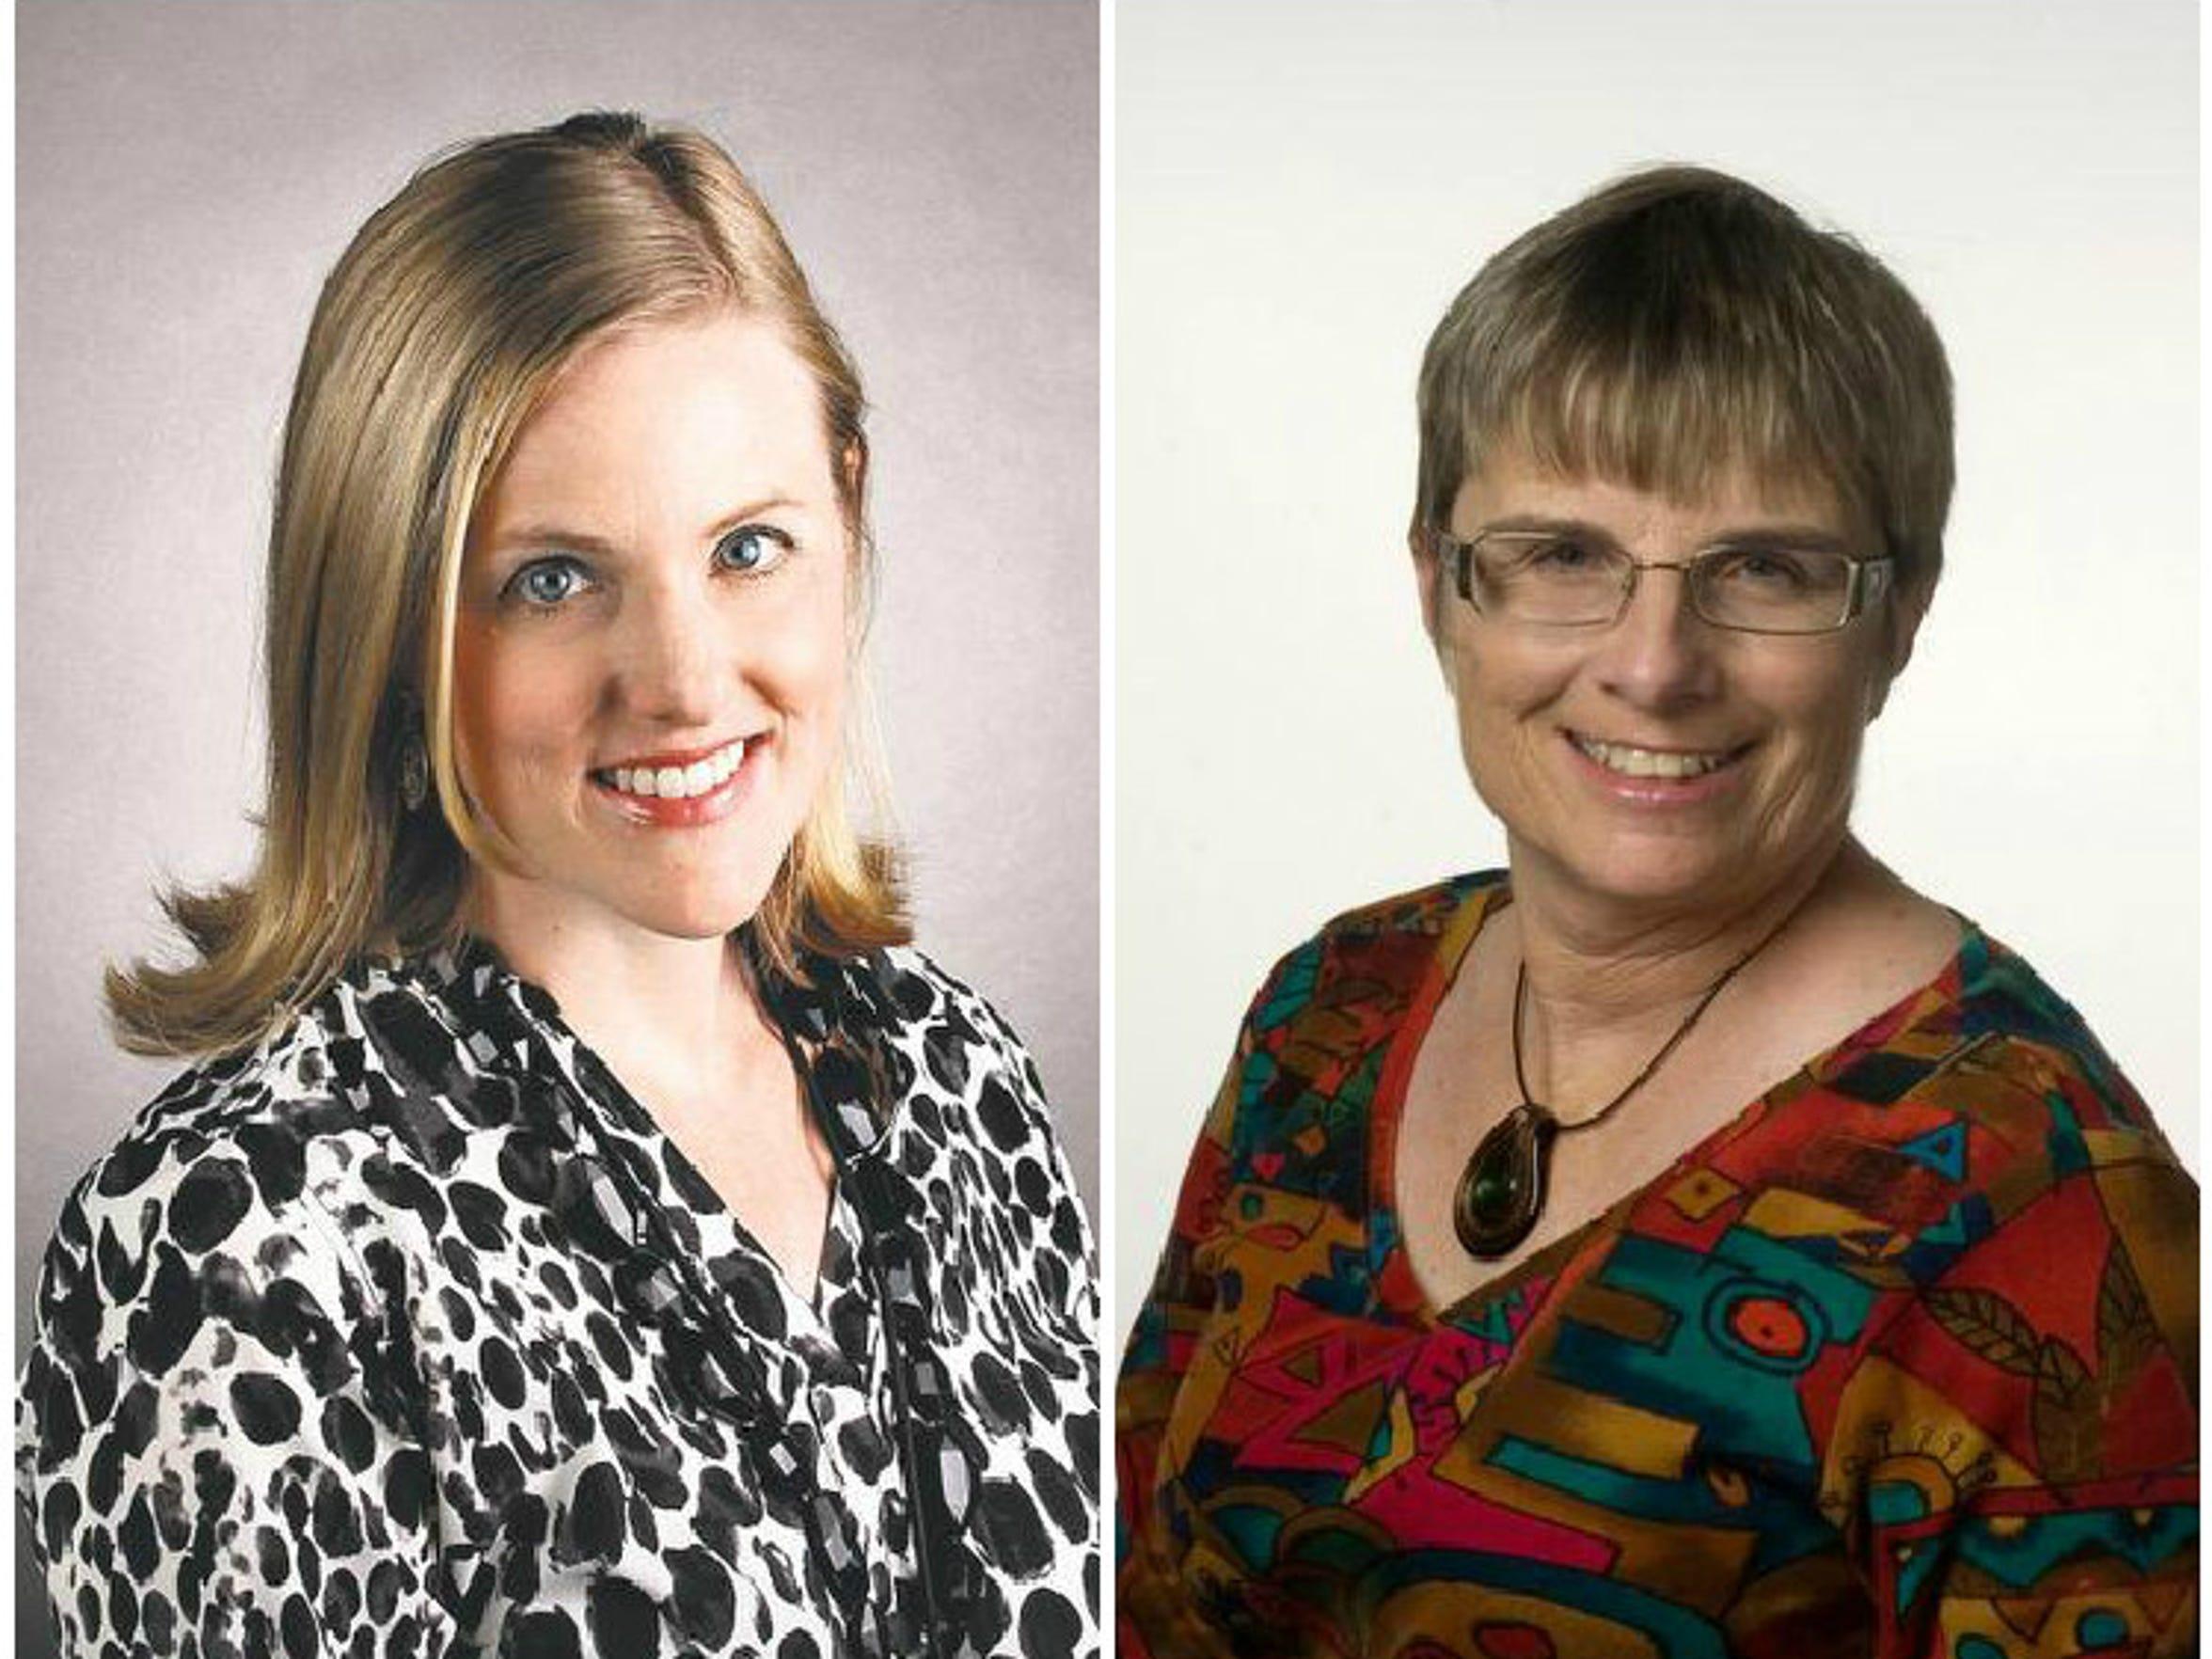 News-Press reporters Janine Zeitlin and Laura Ruane